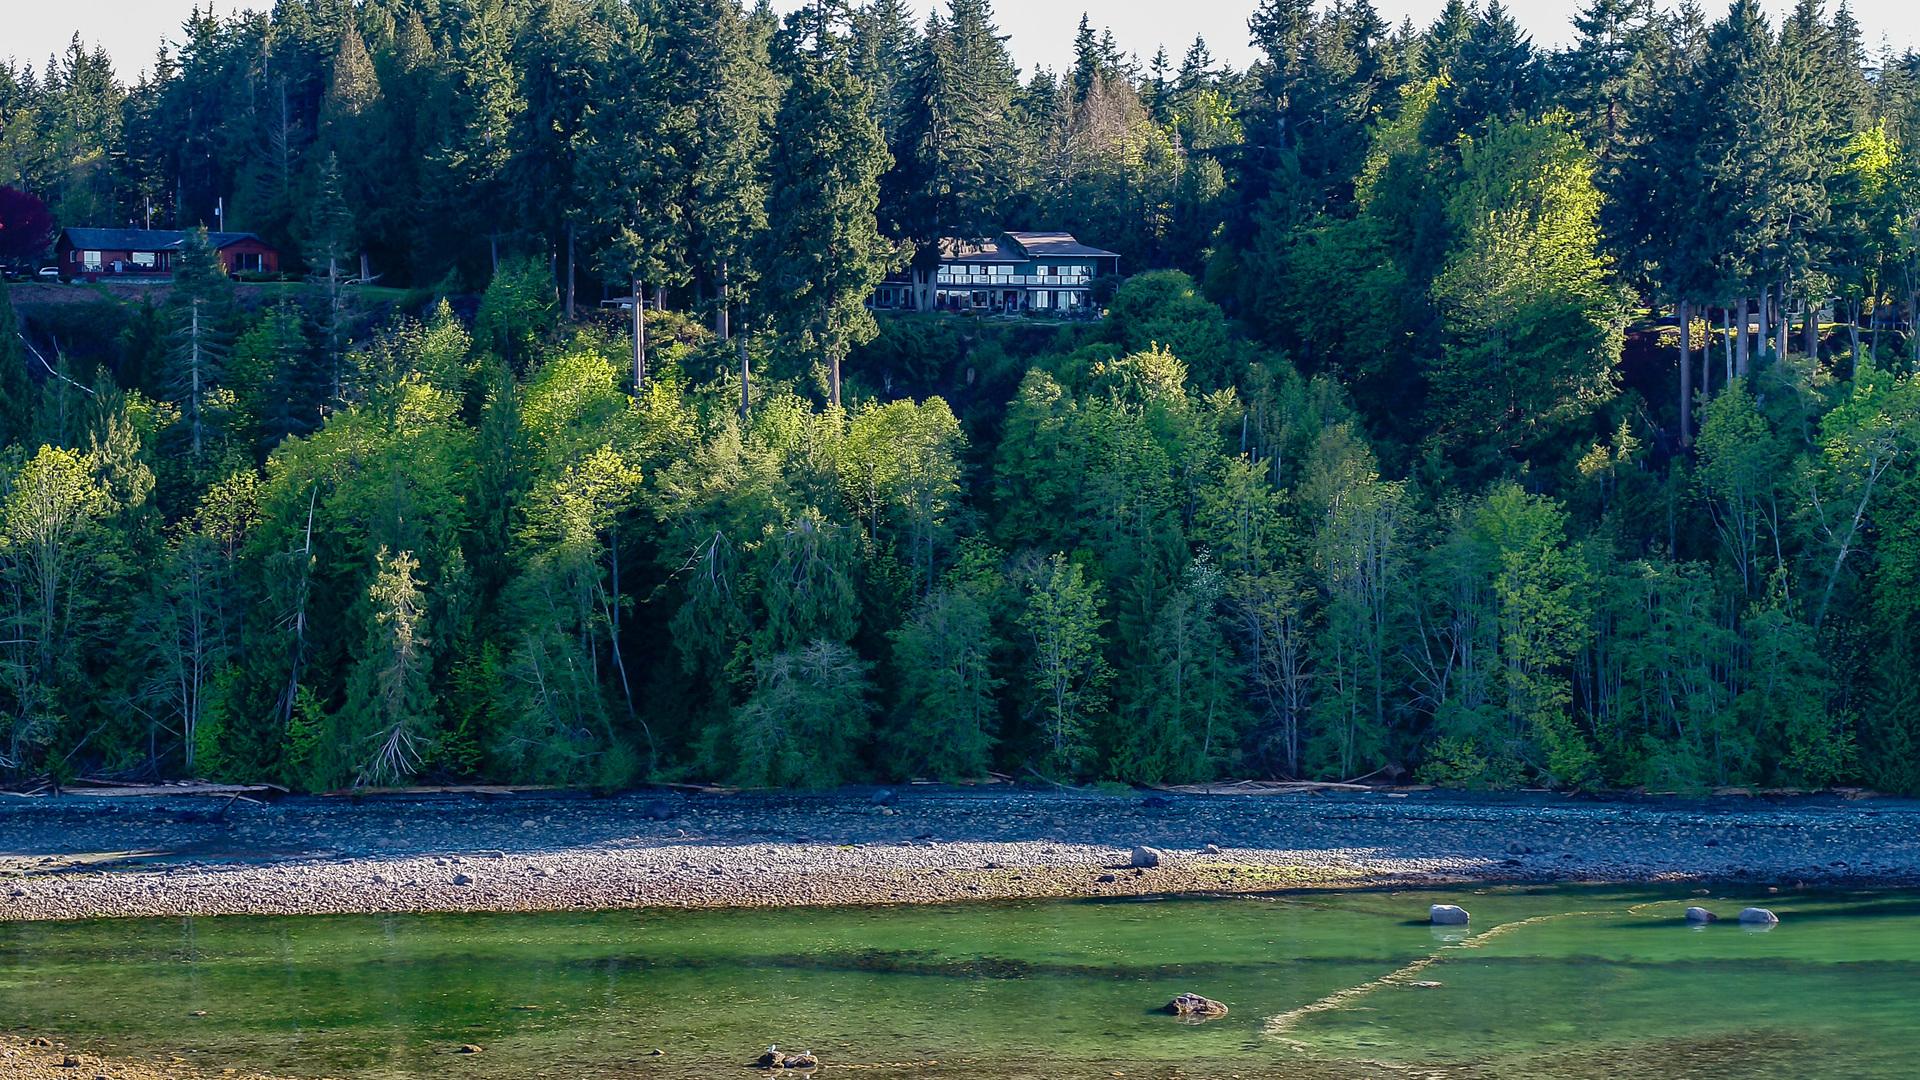 From The Water at 5101 Island Highway West, Qualicum Beach, Zone 05 - Parksville/Qualicum